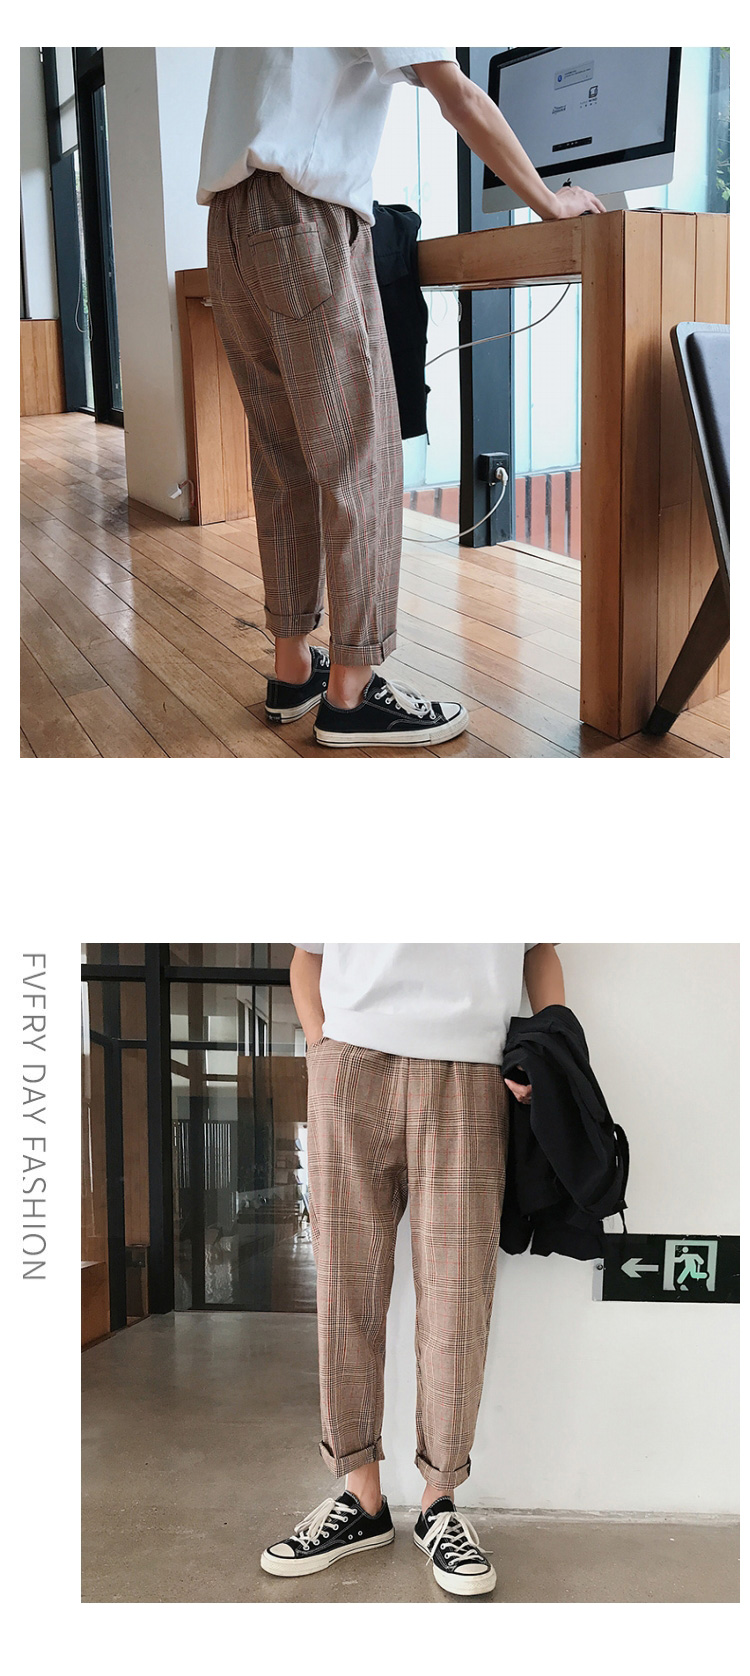 LAPPSTER Streetwear Yellow Plaid Pants Men Joggers 19 Man Casual Straight Harem Pants Men Korean Hip Hop Track Pants Plus Size 16